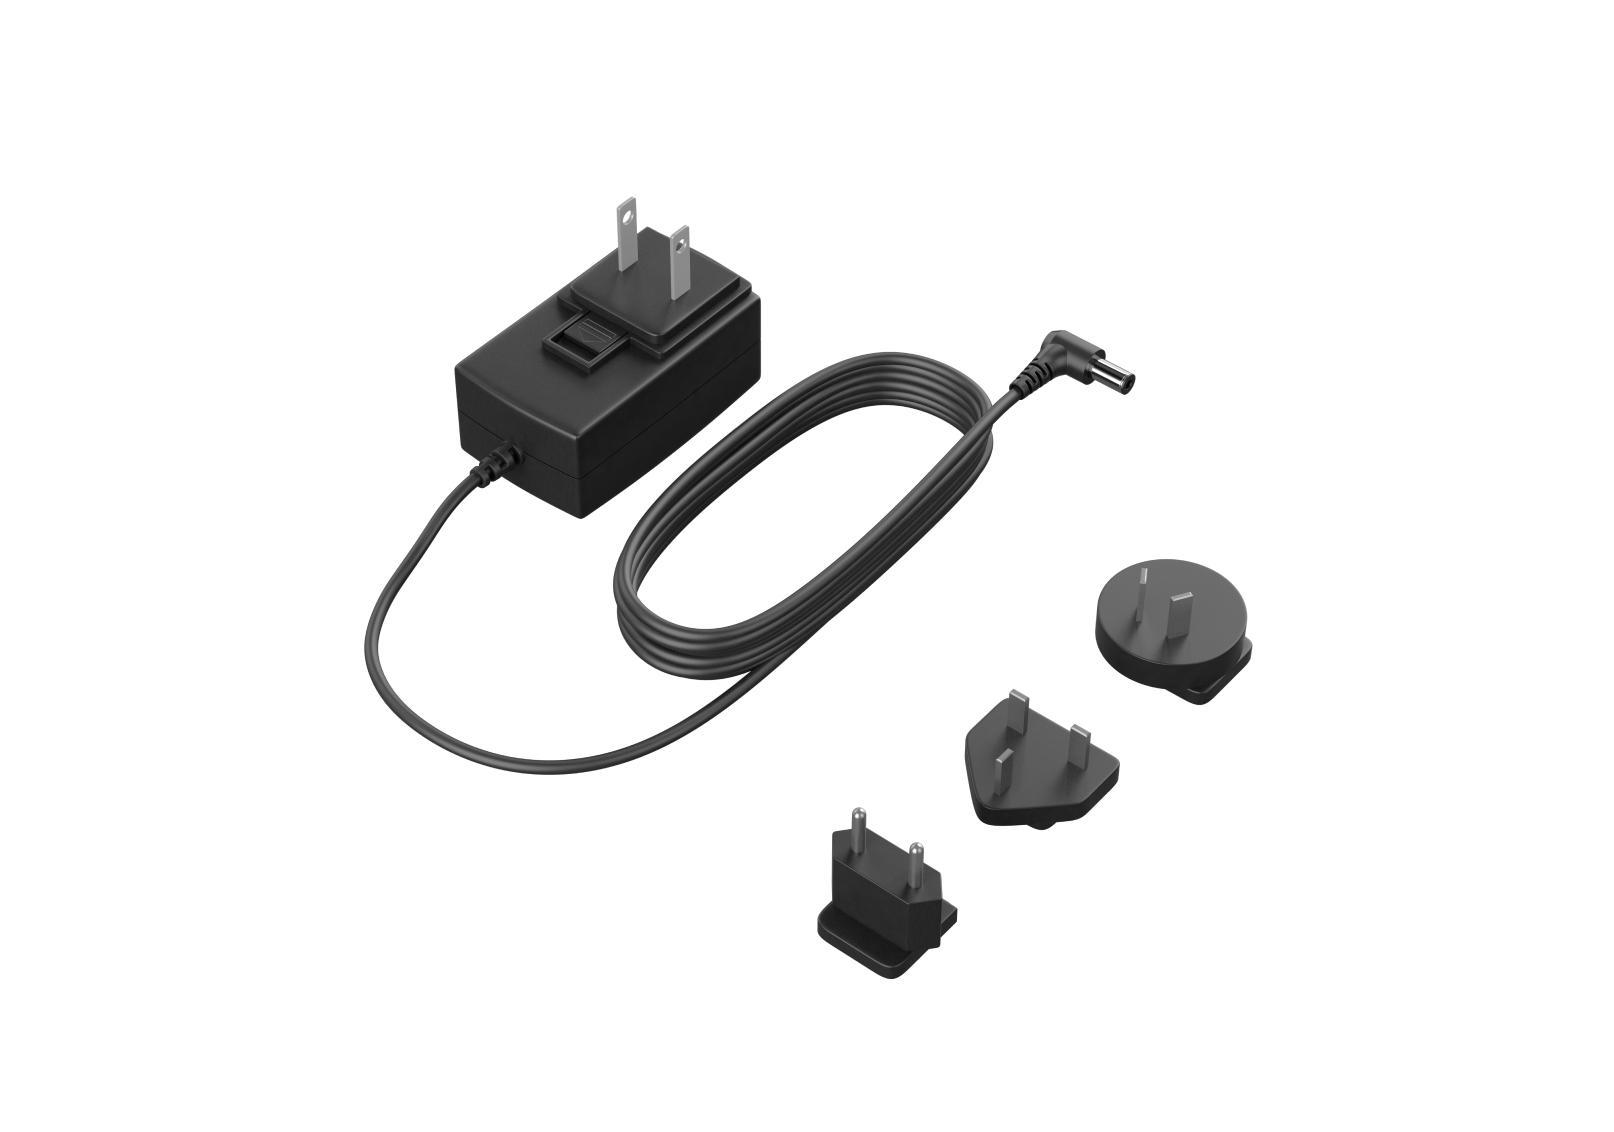 NormaTec 2.0 Leg Standard - Ladekabel EU (Ersatzartikel)